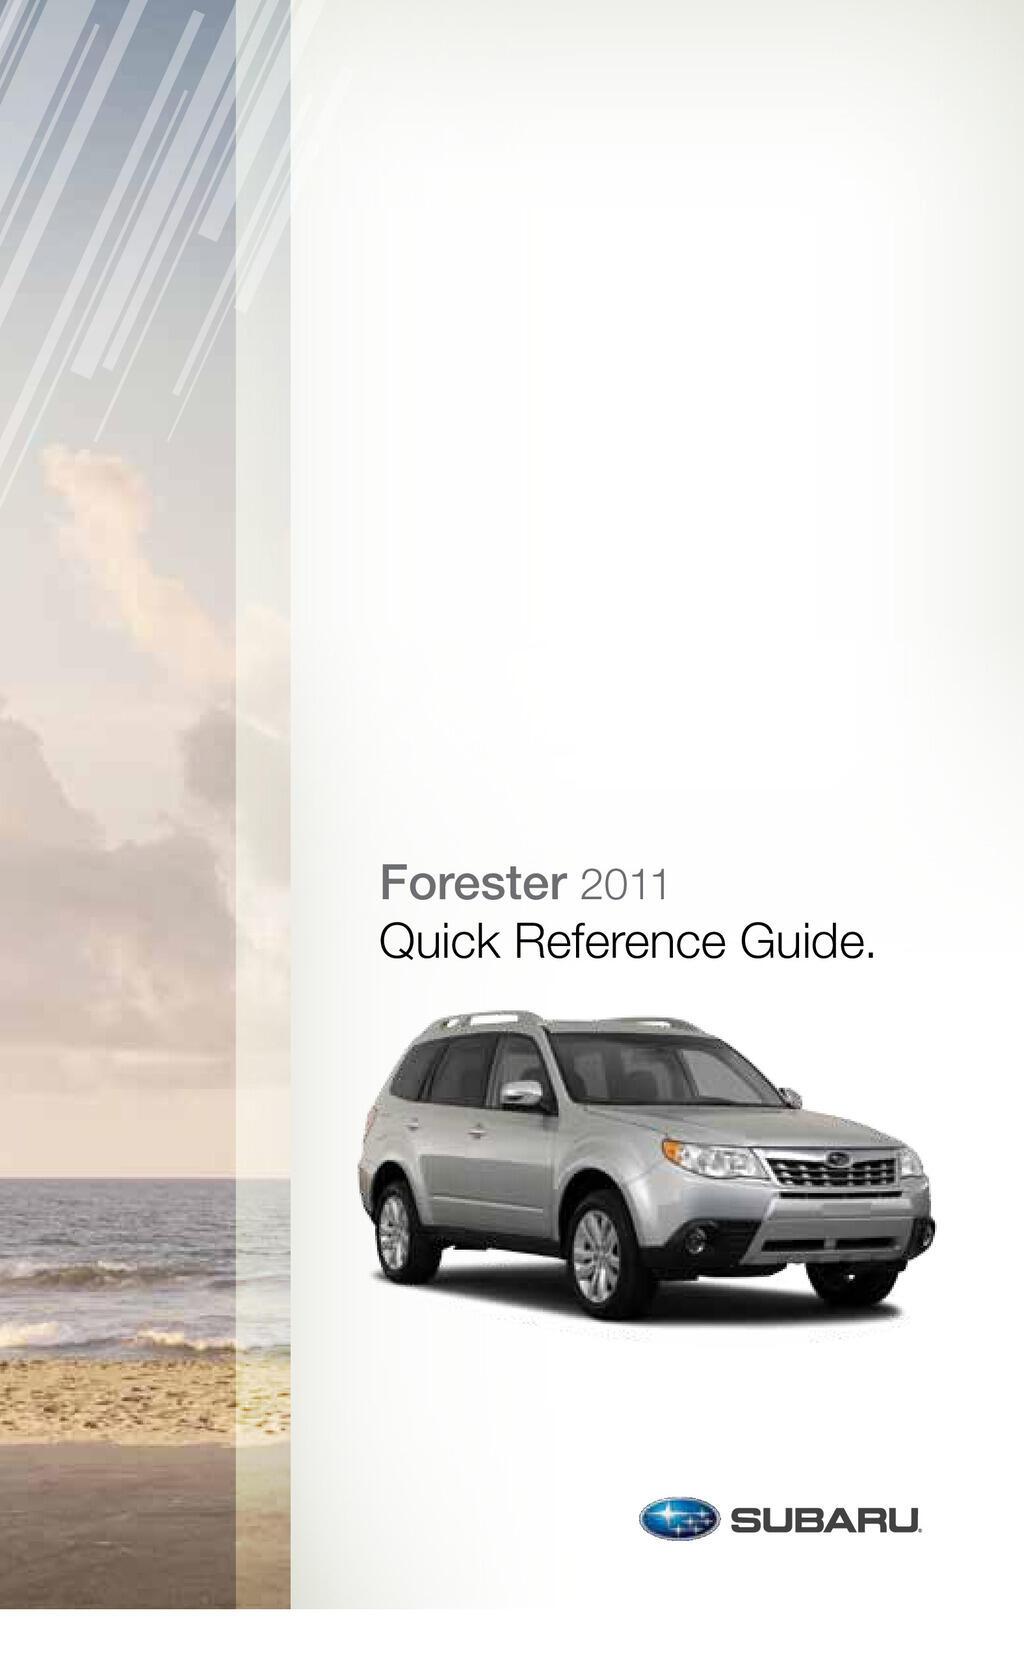 2011 Subaru Forester owners manual